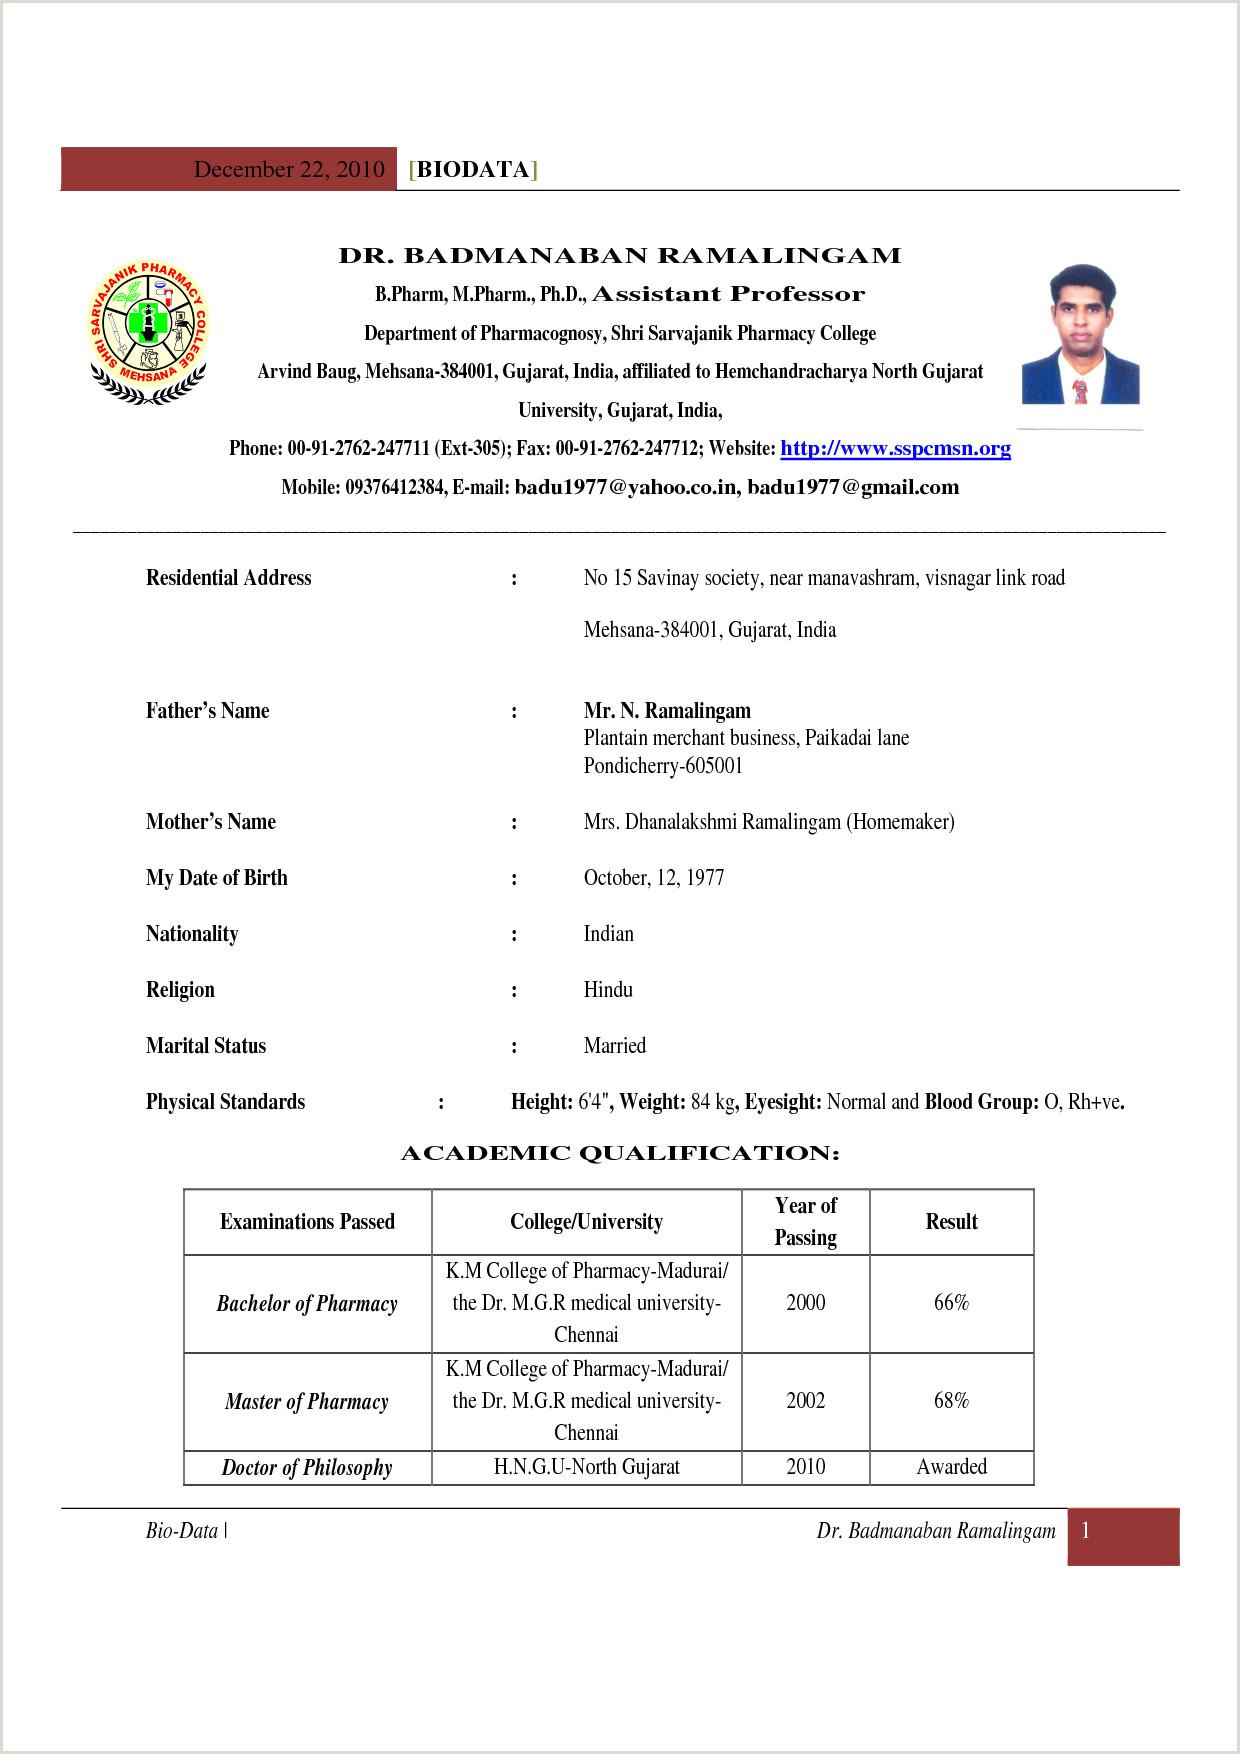 Mca Fresher Resume format In .doc Gujarat 3 Resume format